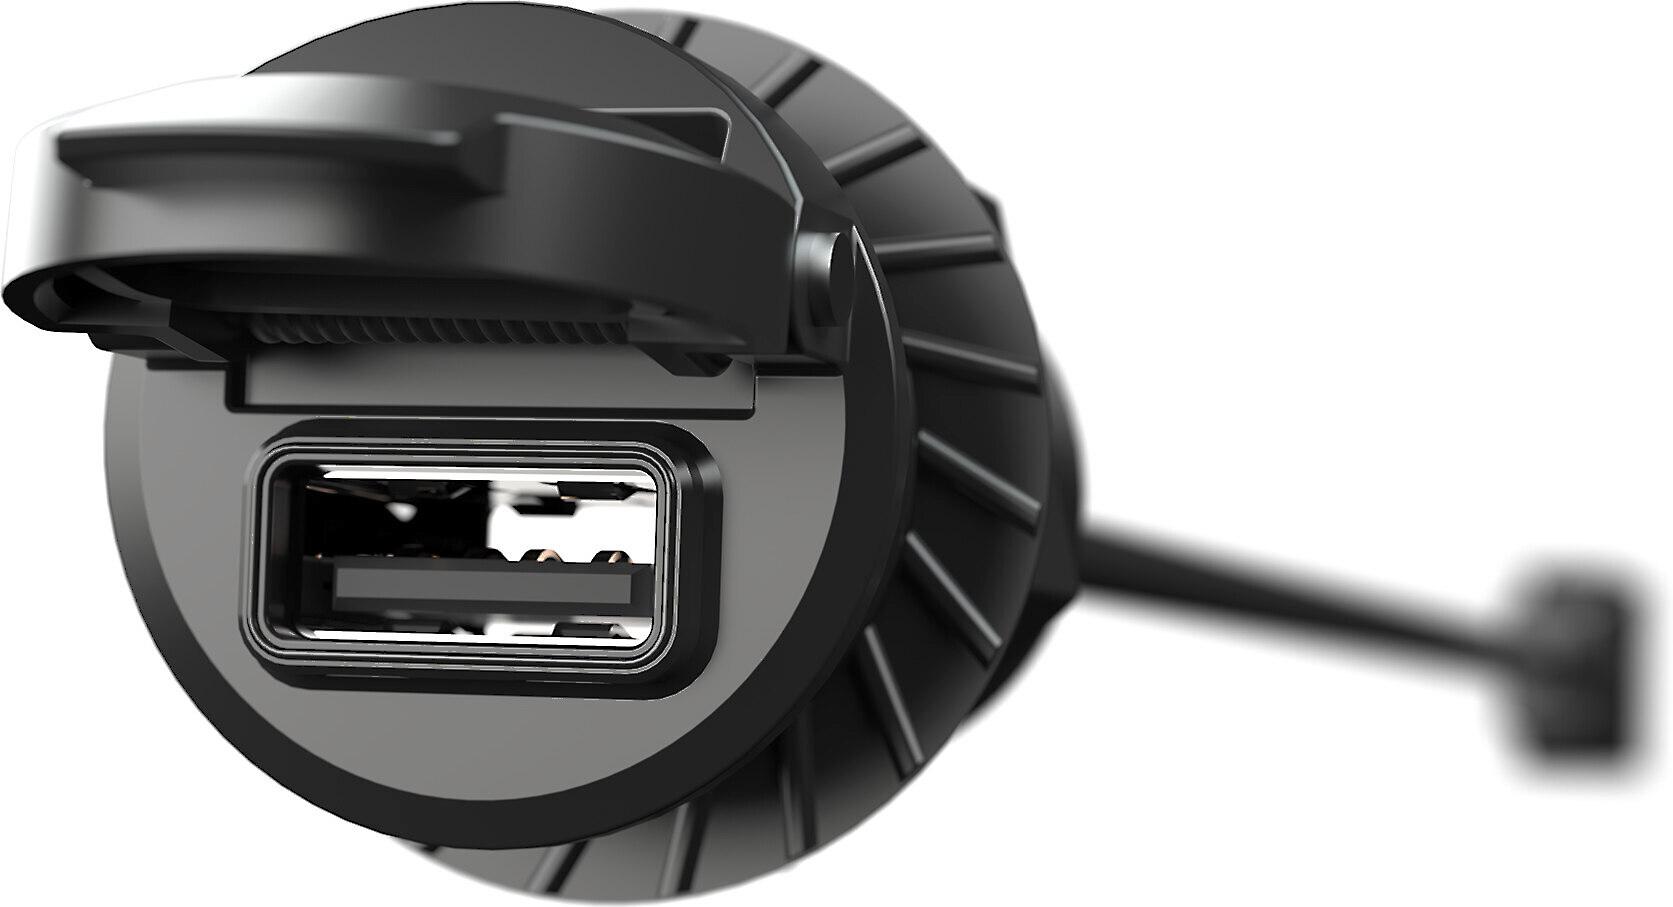 Speakers New 350 Watt 2-CH Motorcycle ATV Boat Scooter Amplifier Weatherproof